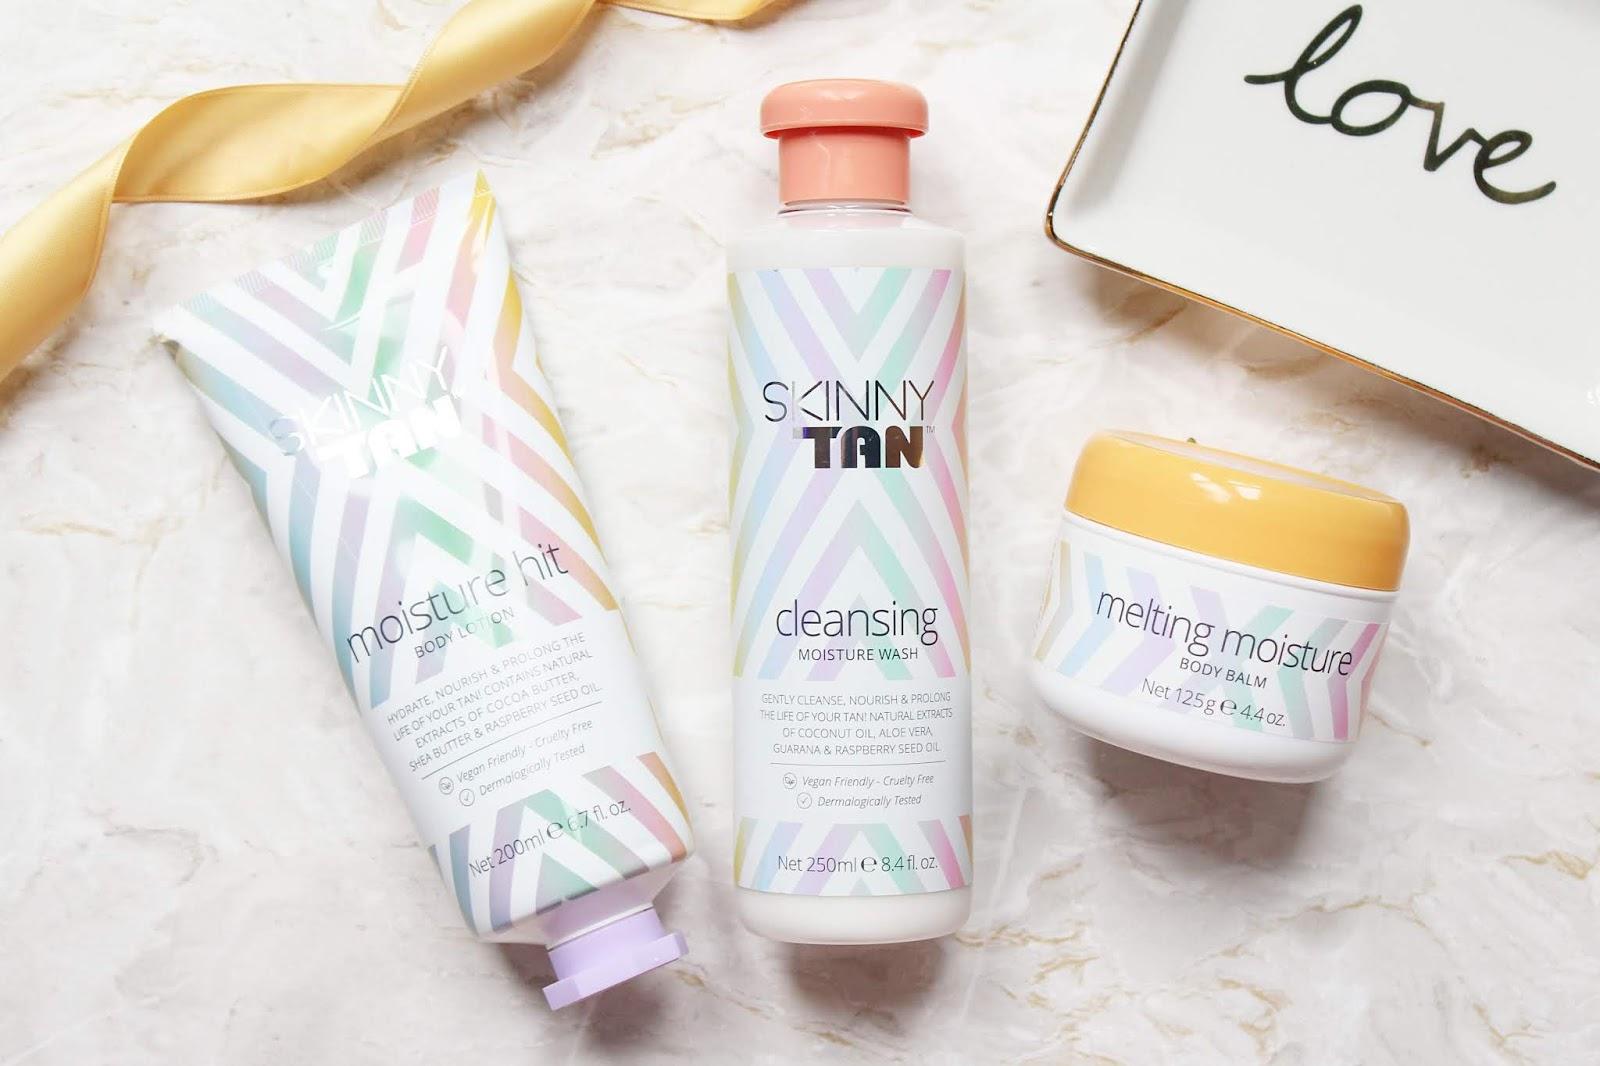 Skinny Tan Body Care Trio